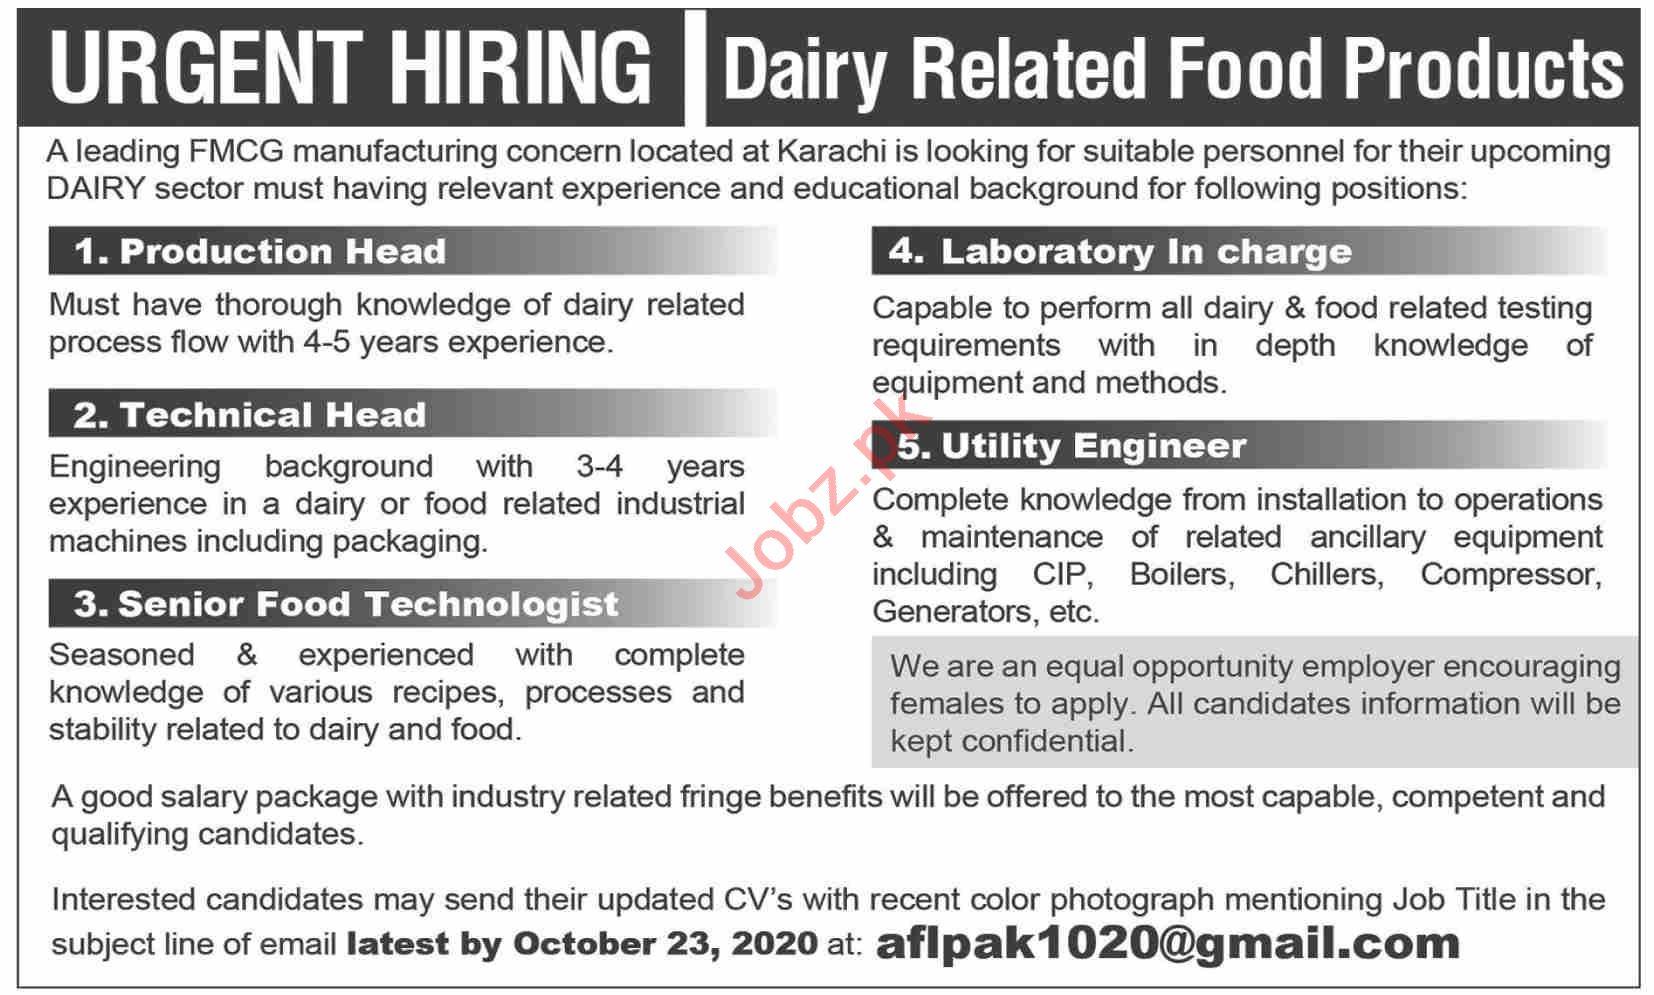 Production Head & Utility Engineer Jobs 2020 in Karachi